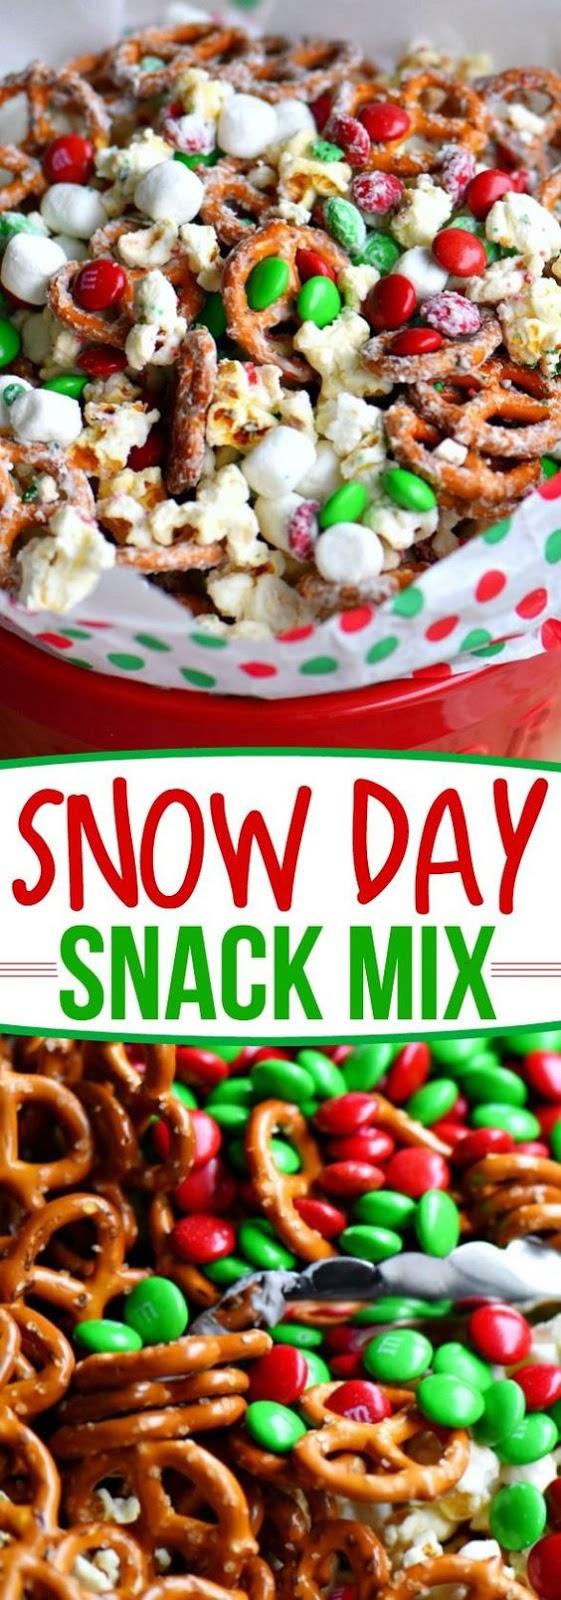 Snow Day Snack Mix